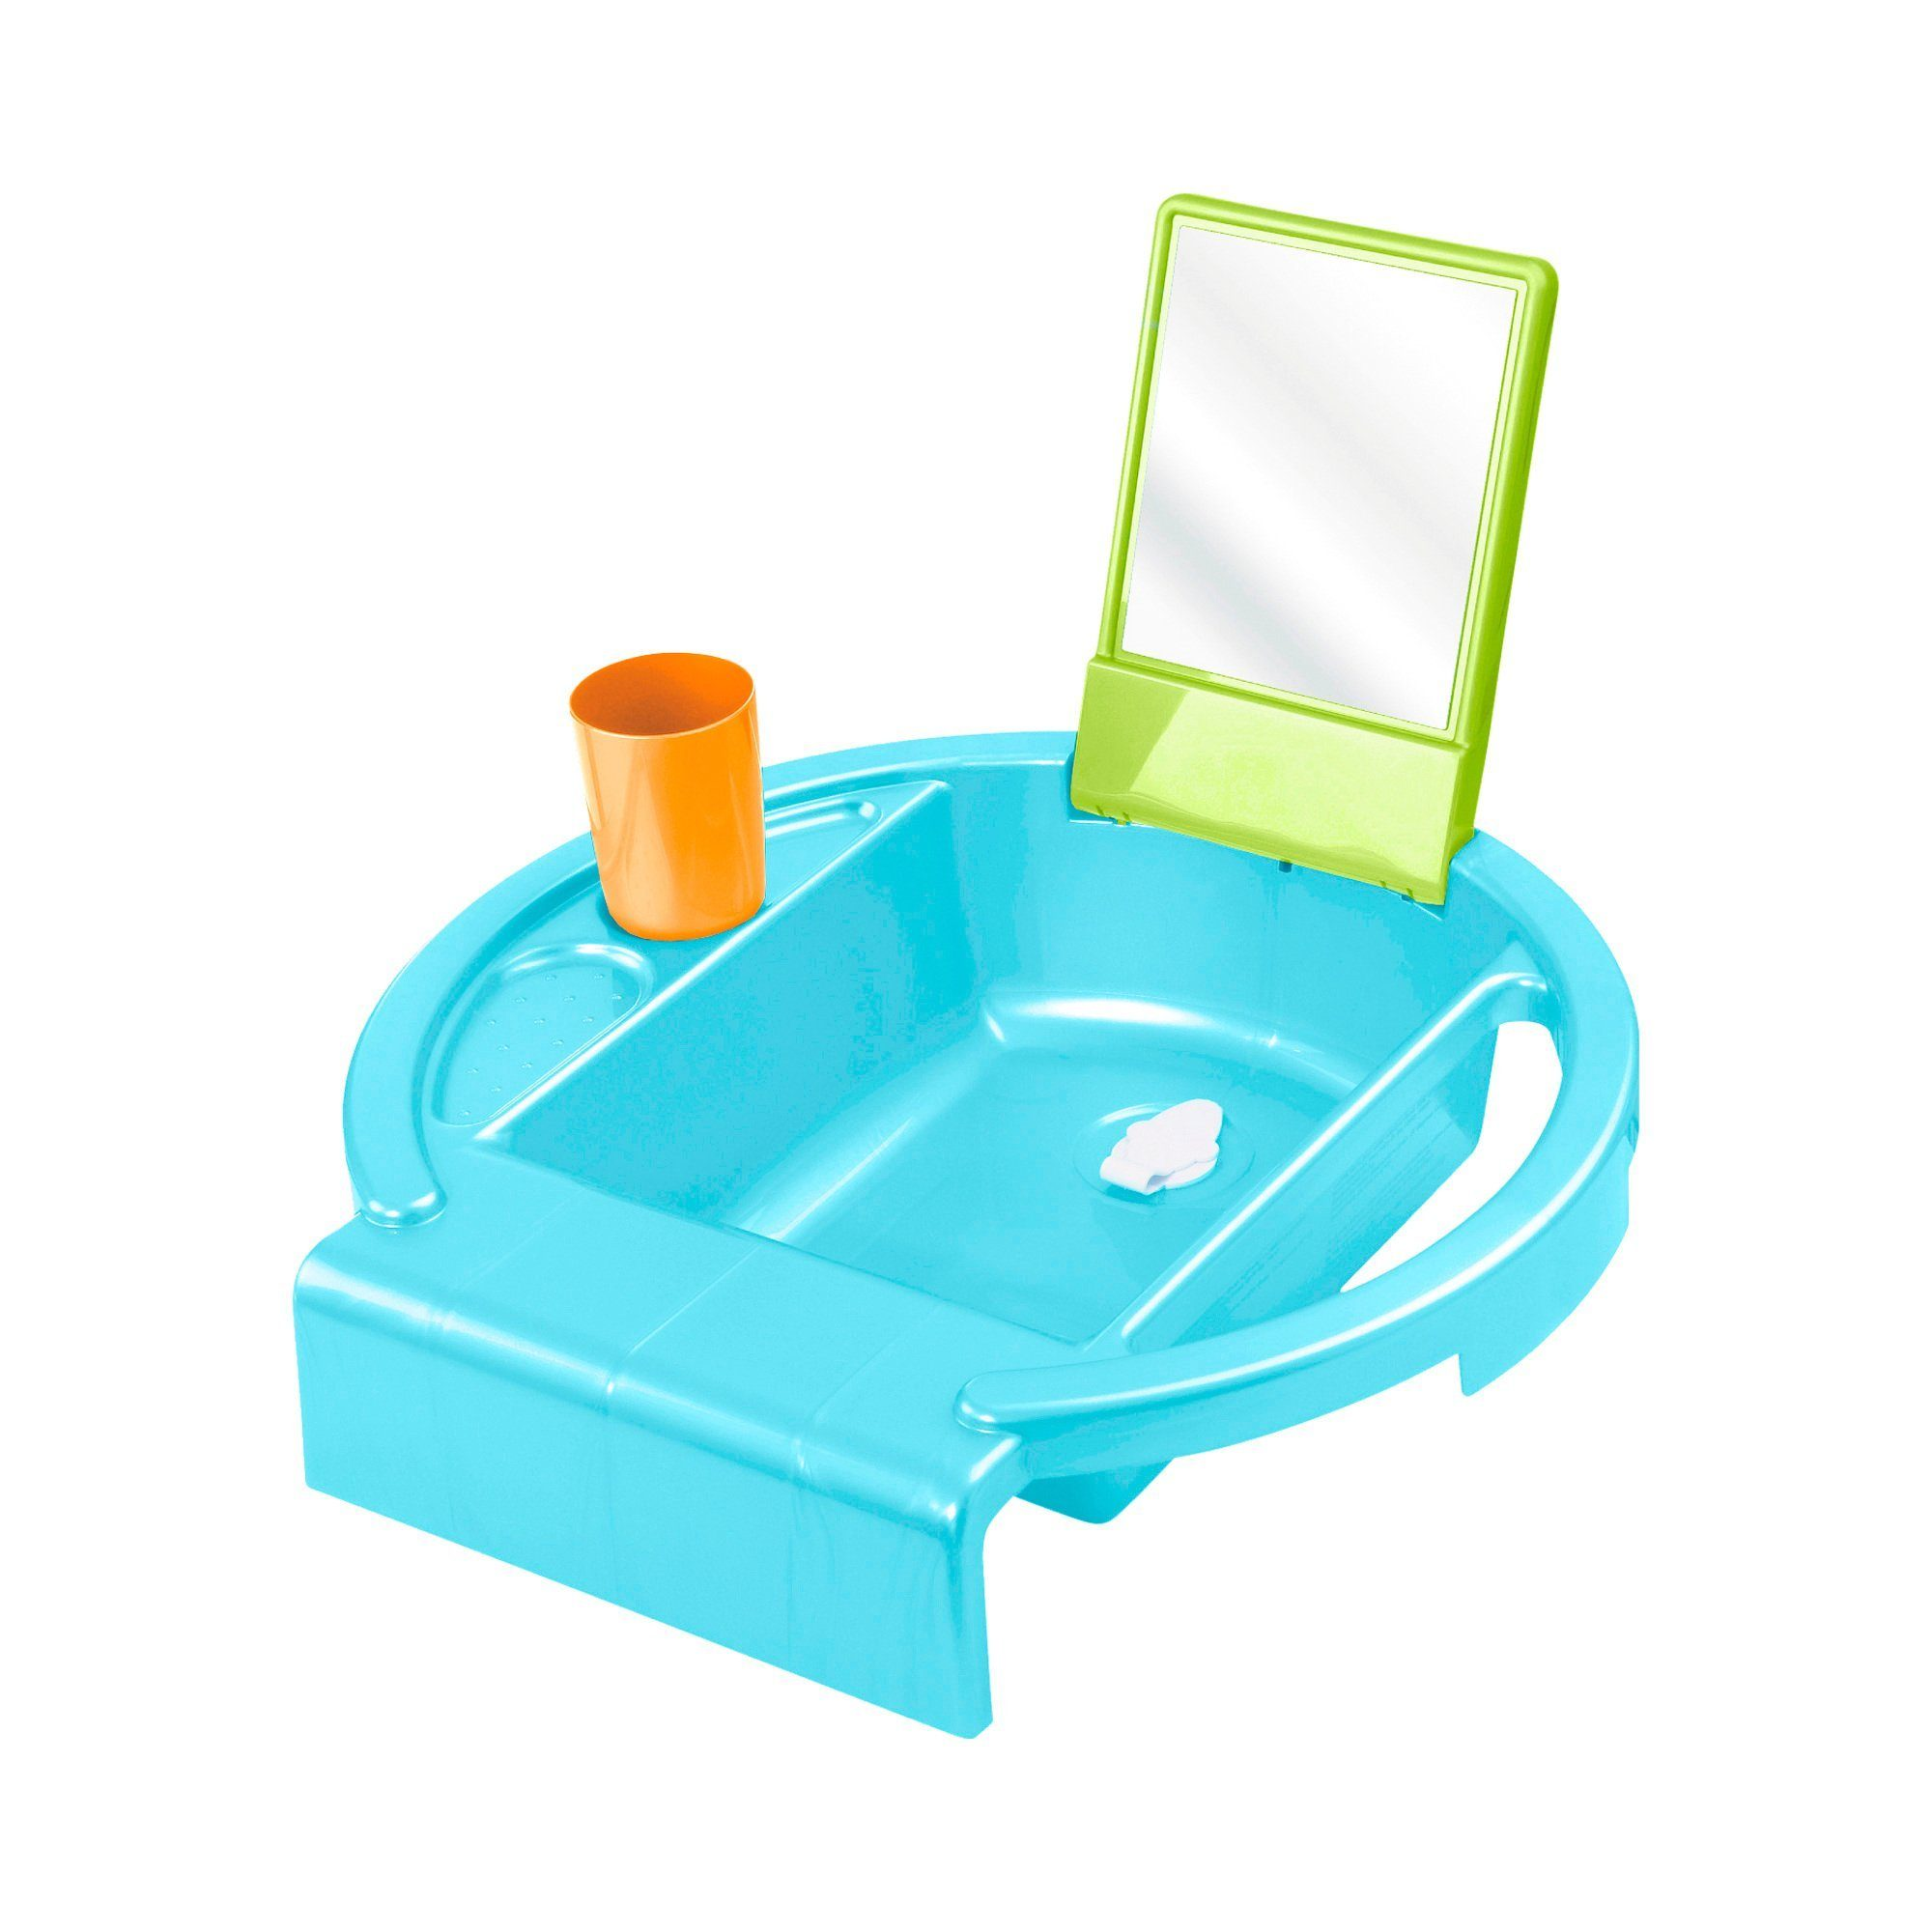 ROTHO BABYDESIGN Waschschüssel Kiddy Wash